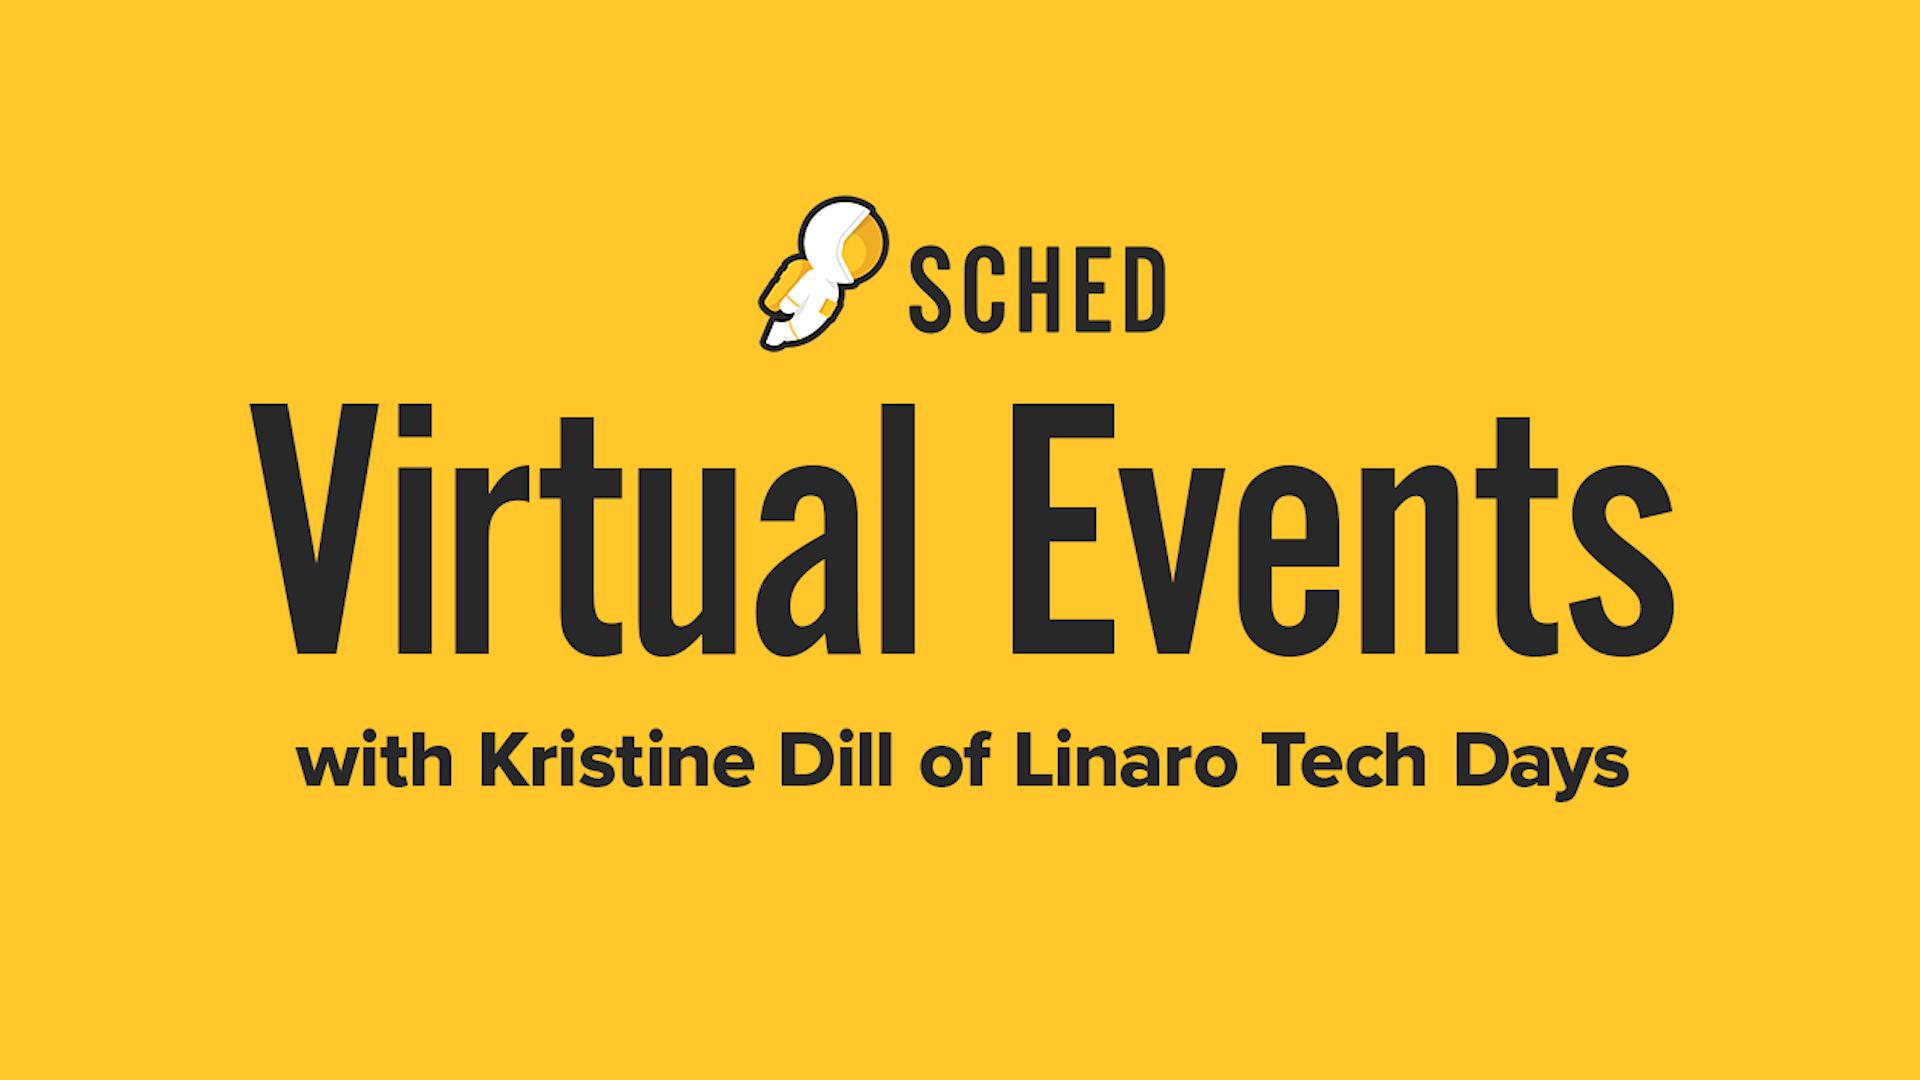 Virtual Events Video